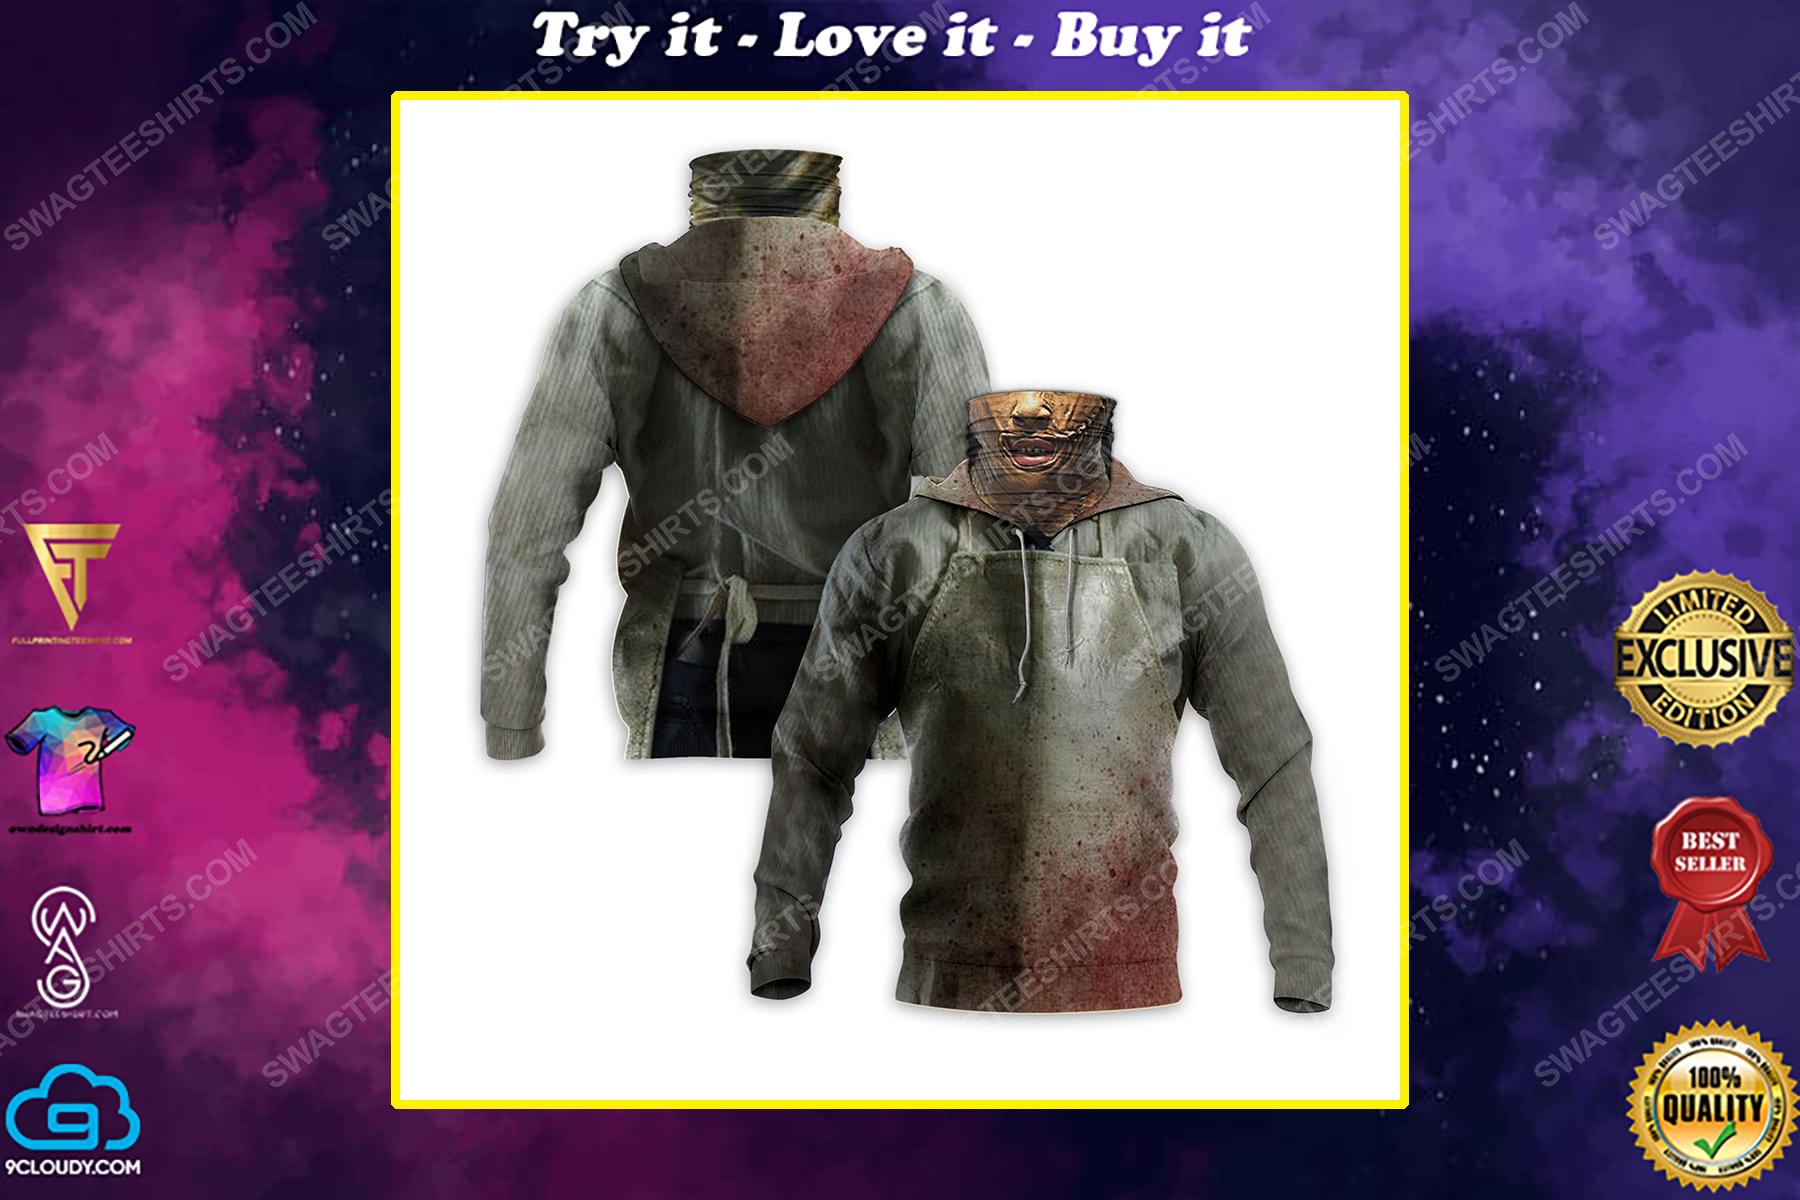 Horror movie leatherface for halloween full print mask hoodie